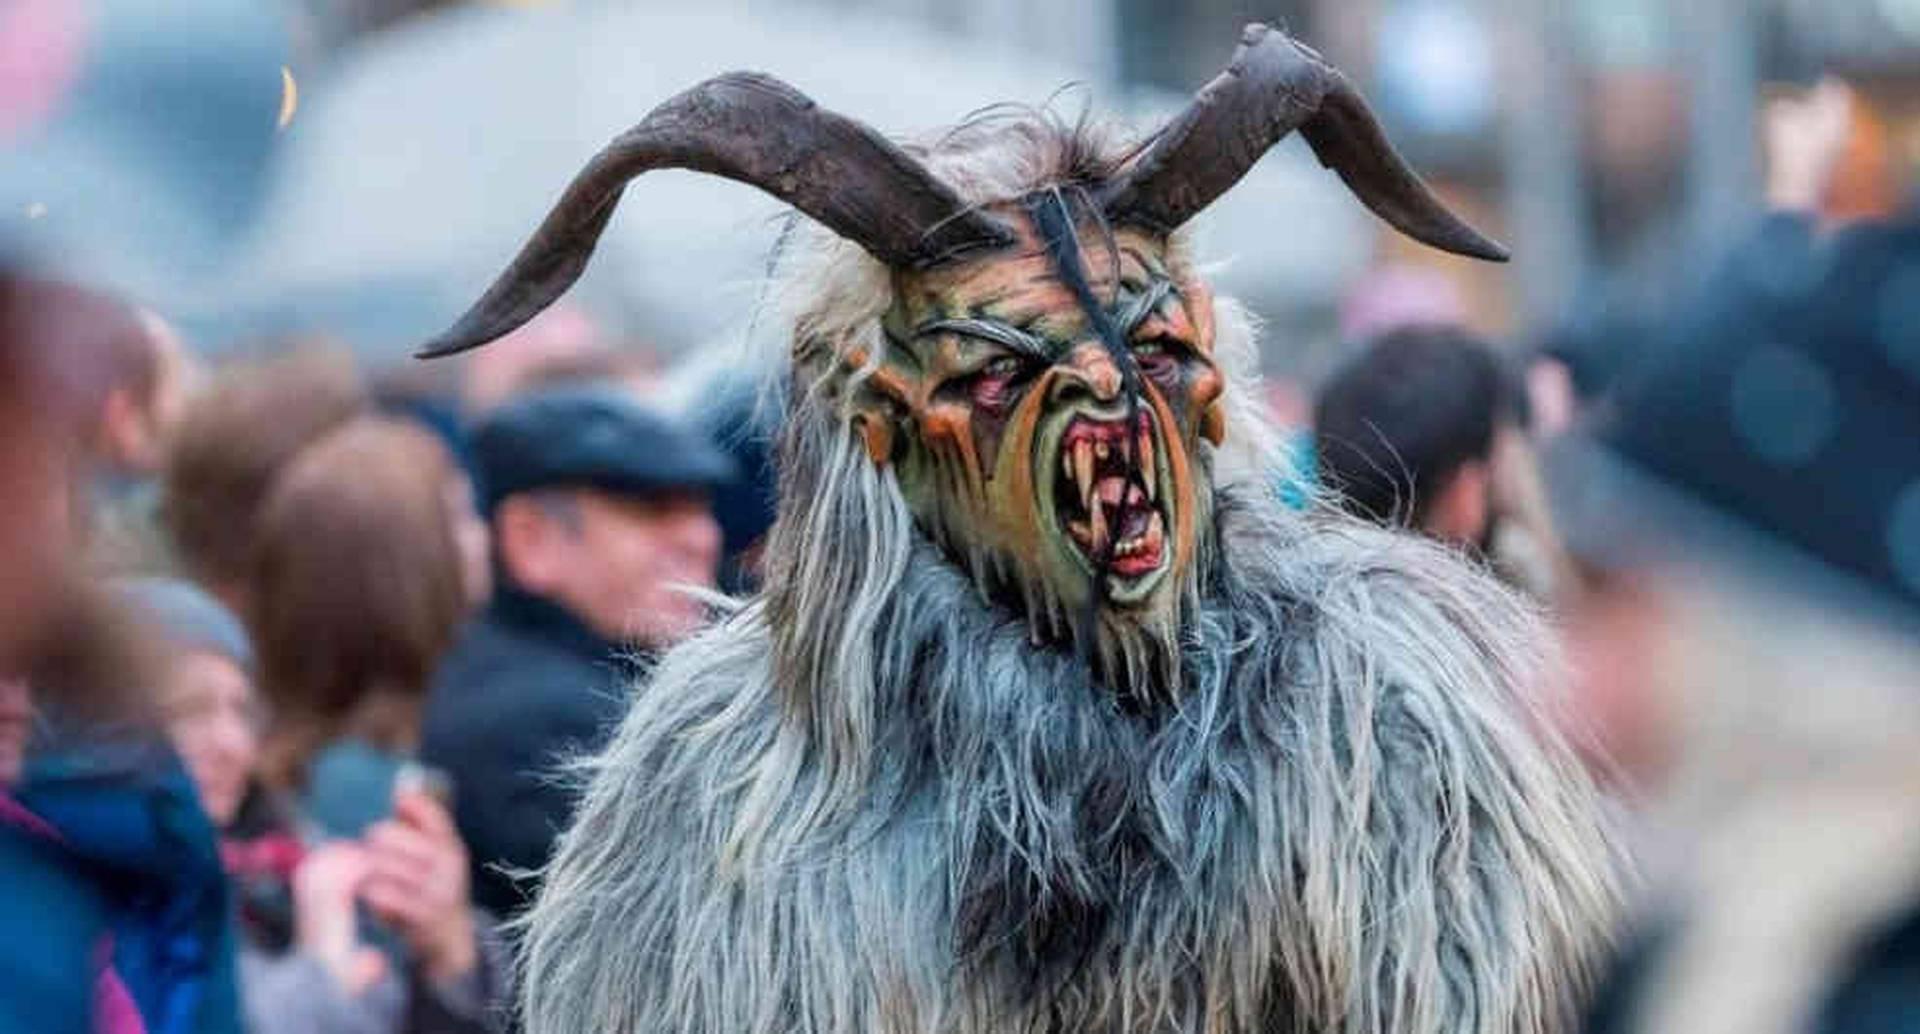 ¿Conoces al temible Krampus? Foto: Getty Images/BBC